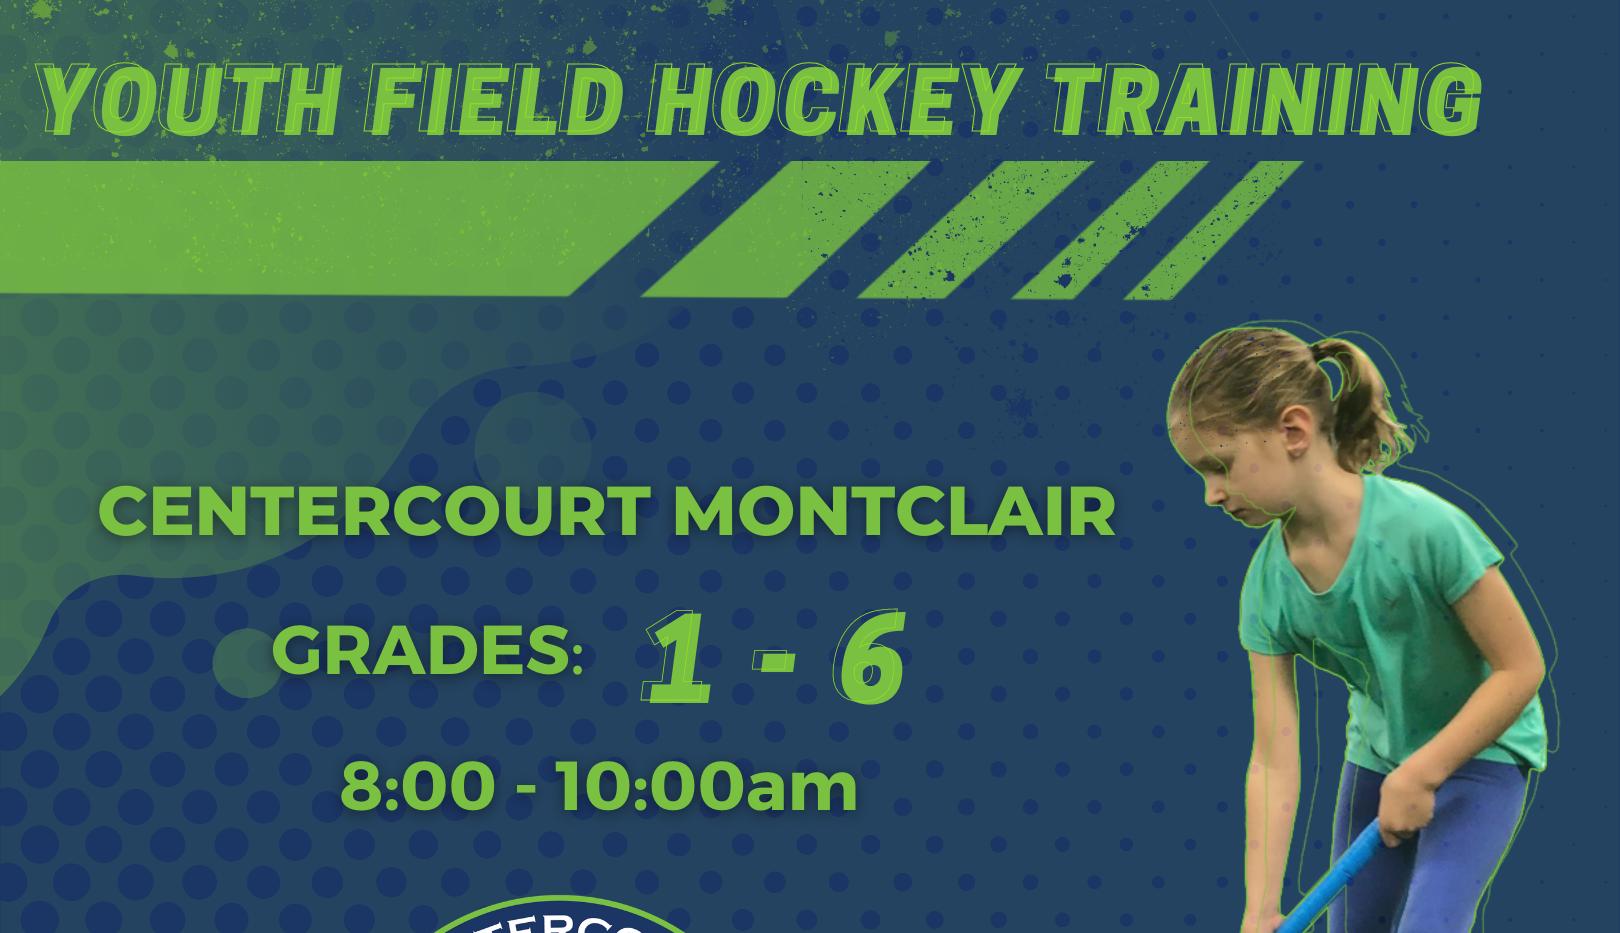 Hockey Training Advertisement